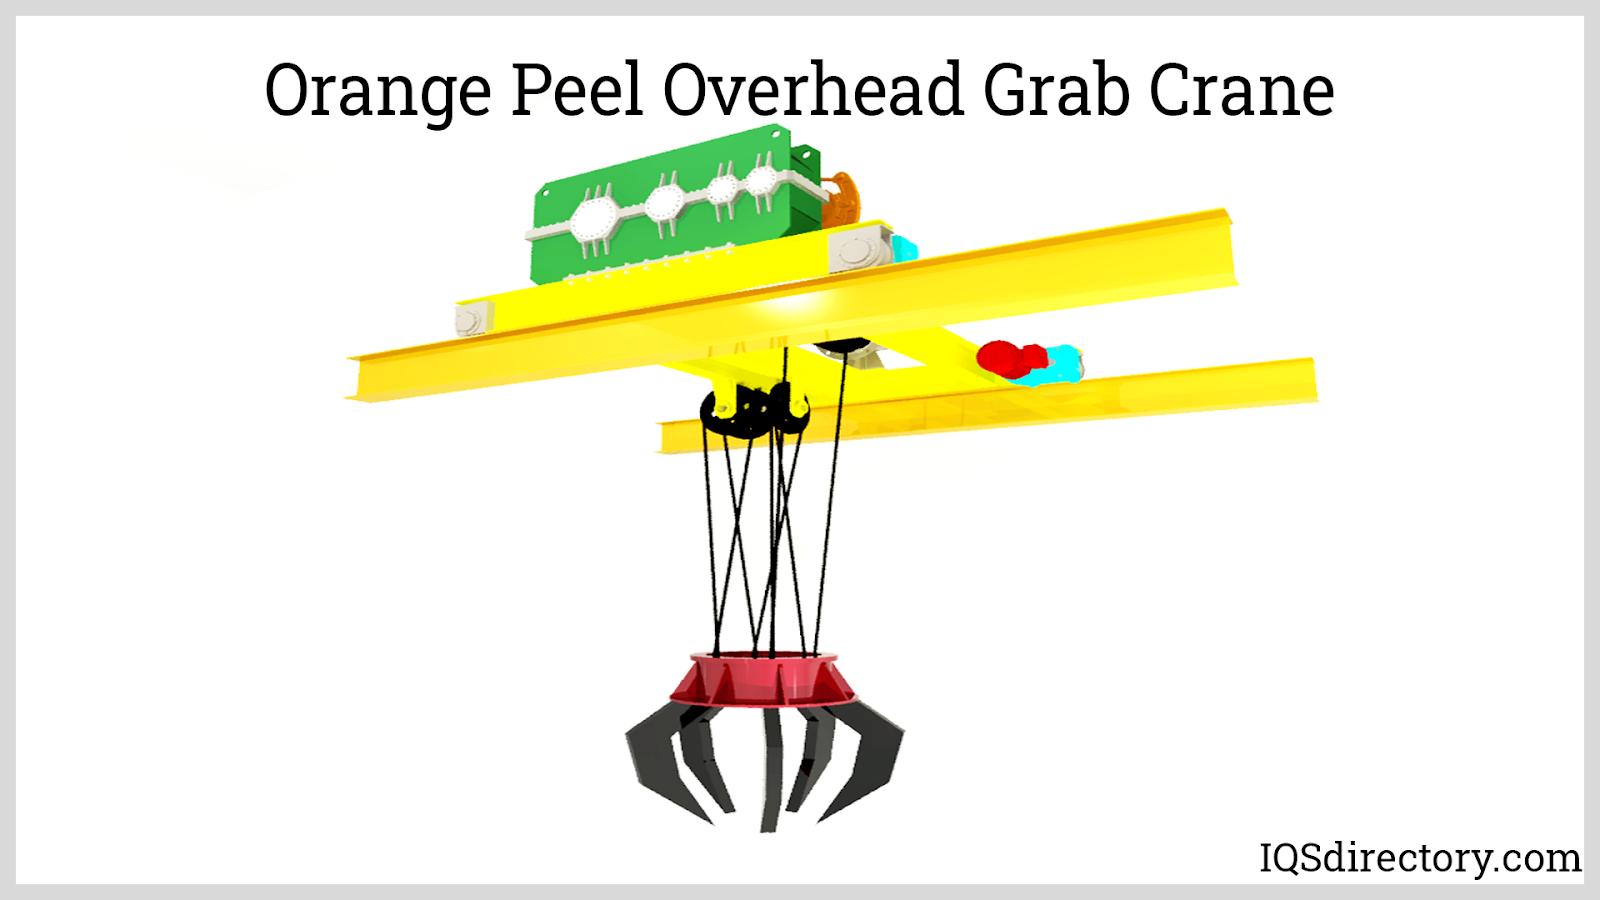 Orange Peel Overhead Grab Crane